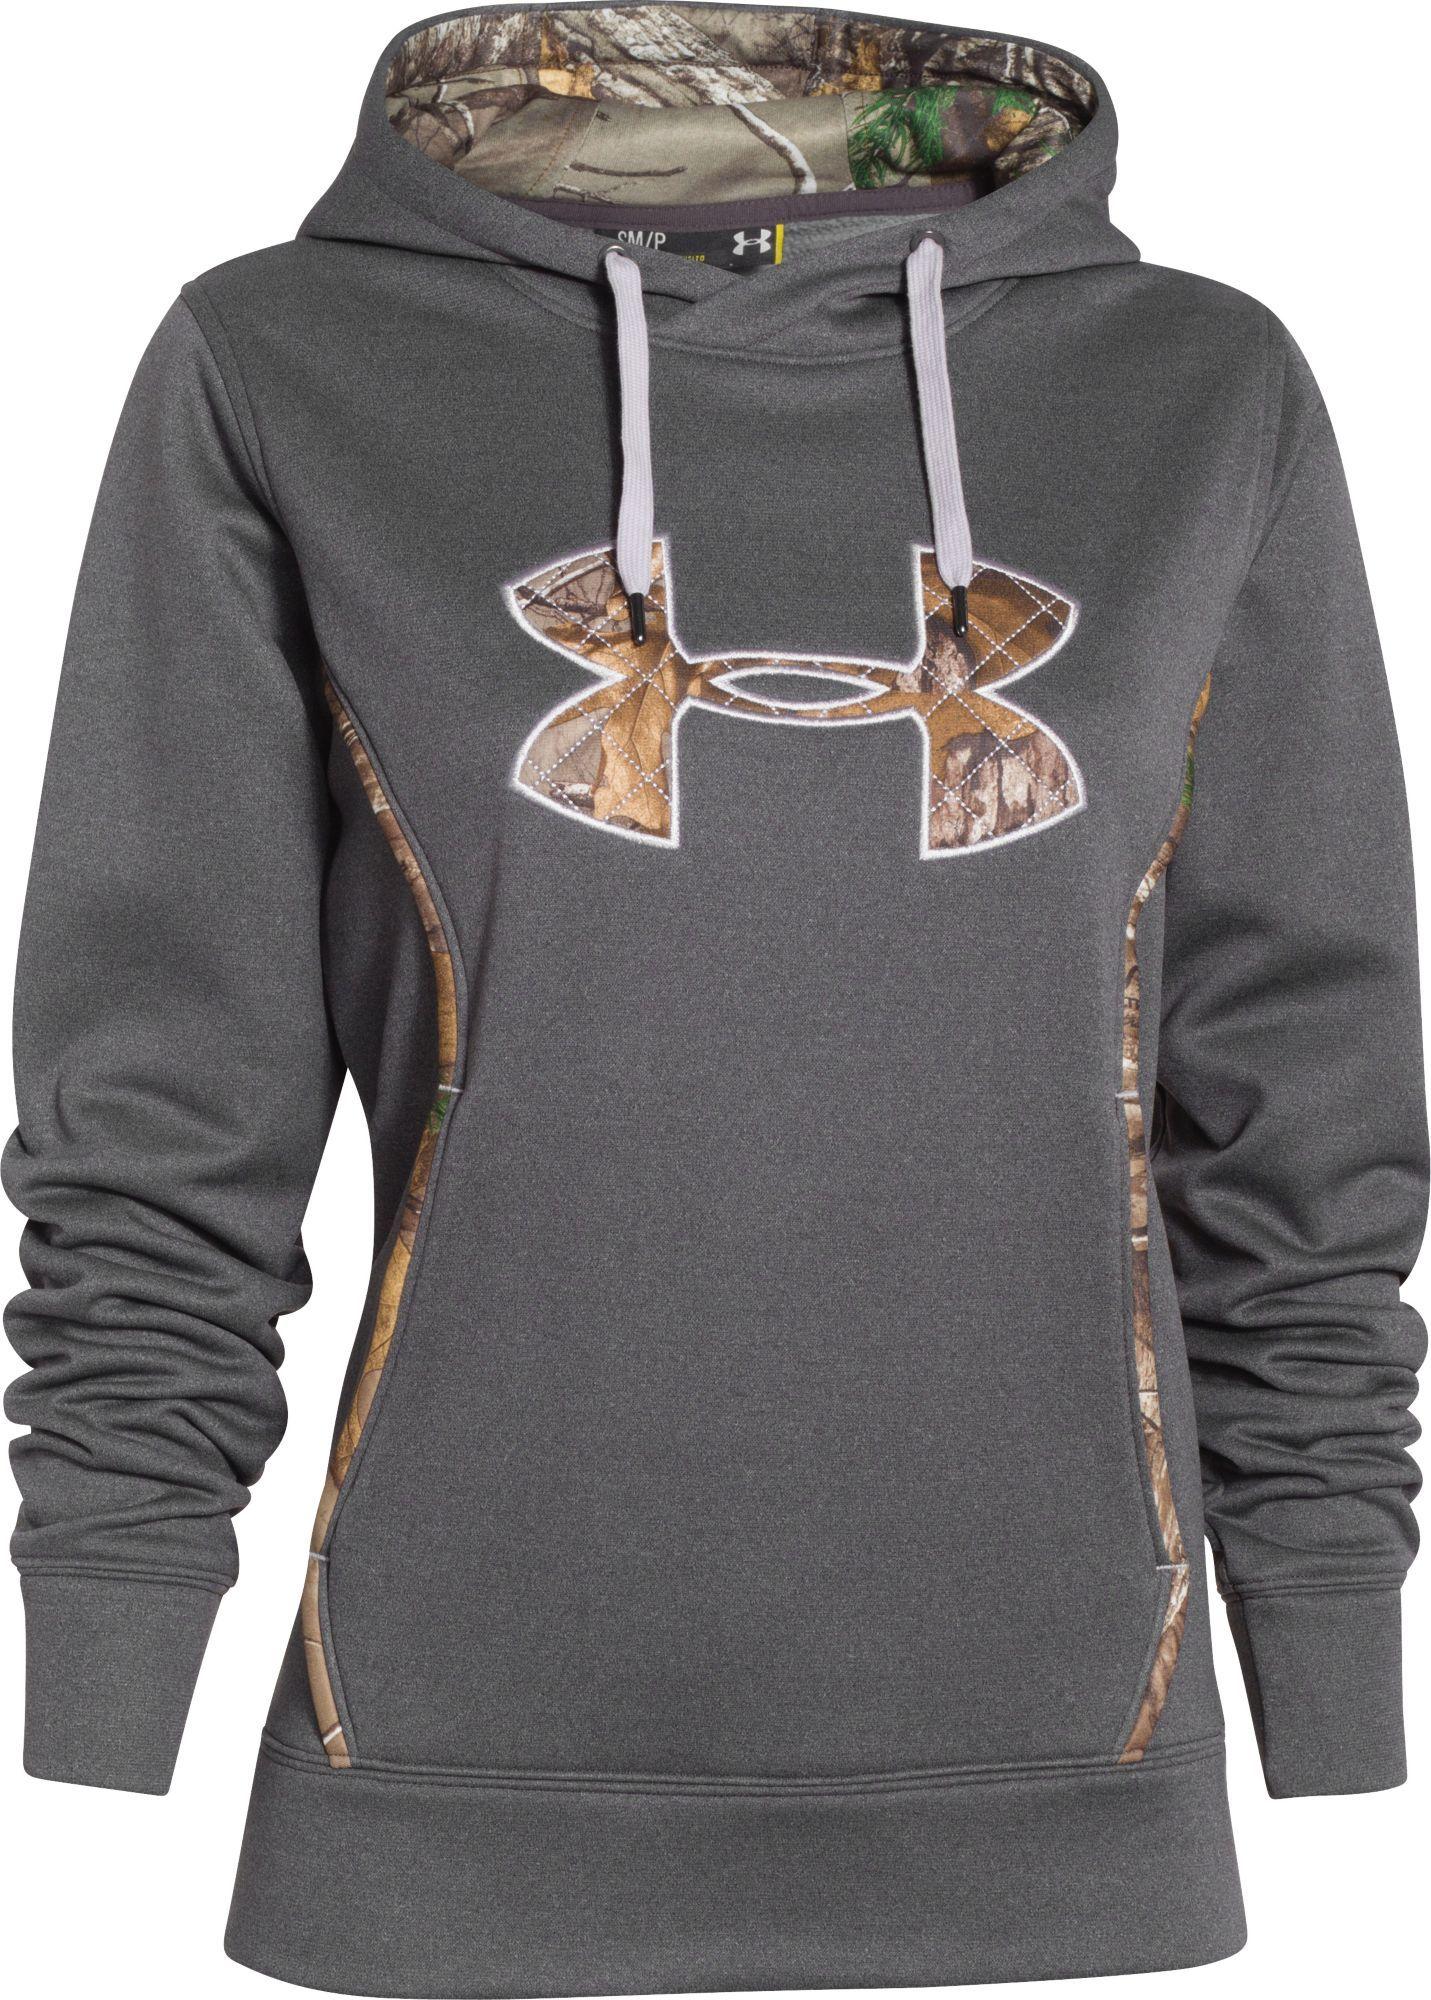 a050768b52392 Under Armour Mens Storm Caliber Hooded Sweatshirt Polyester – EDGE ...